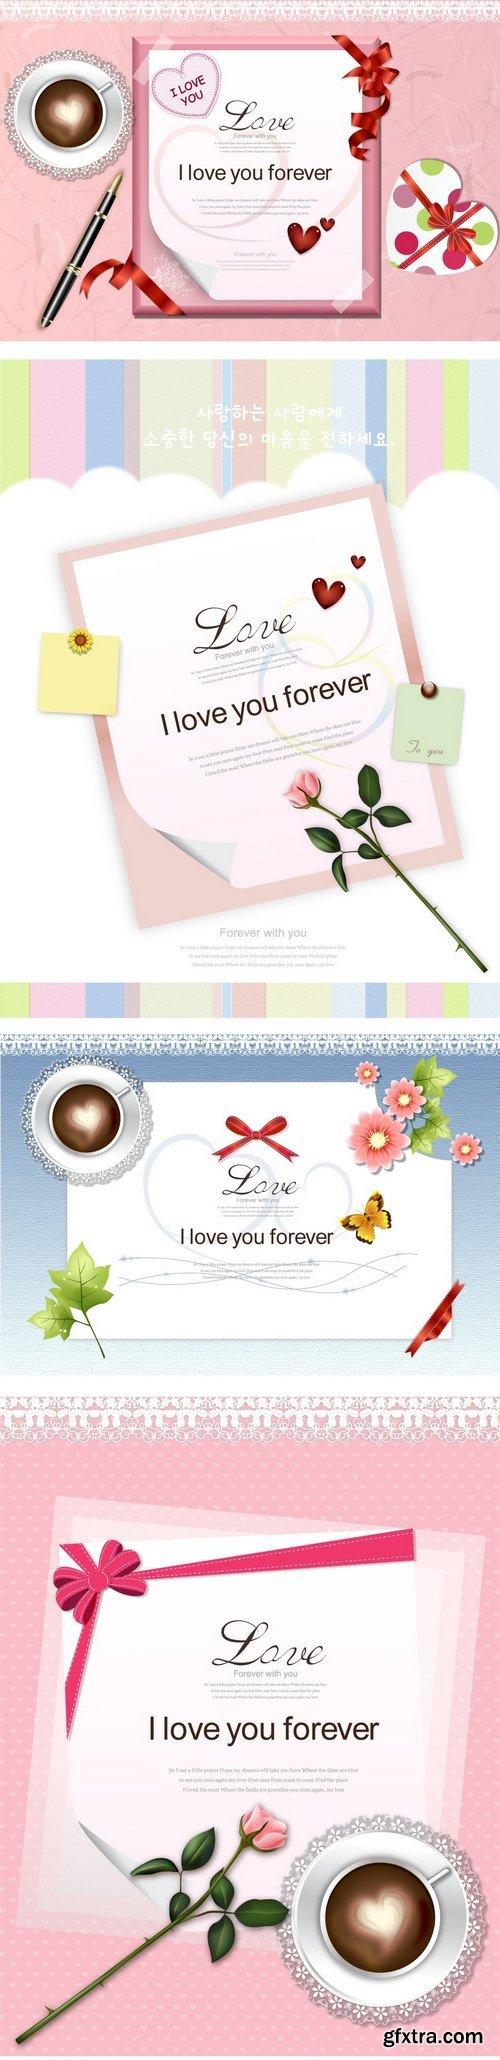 Romantic and love theme 1